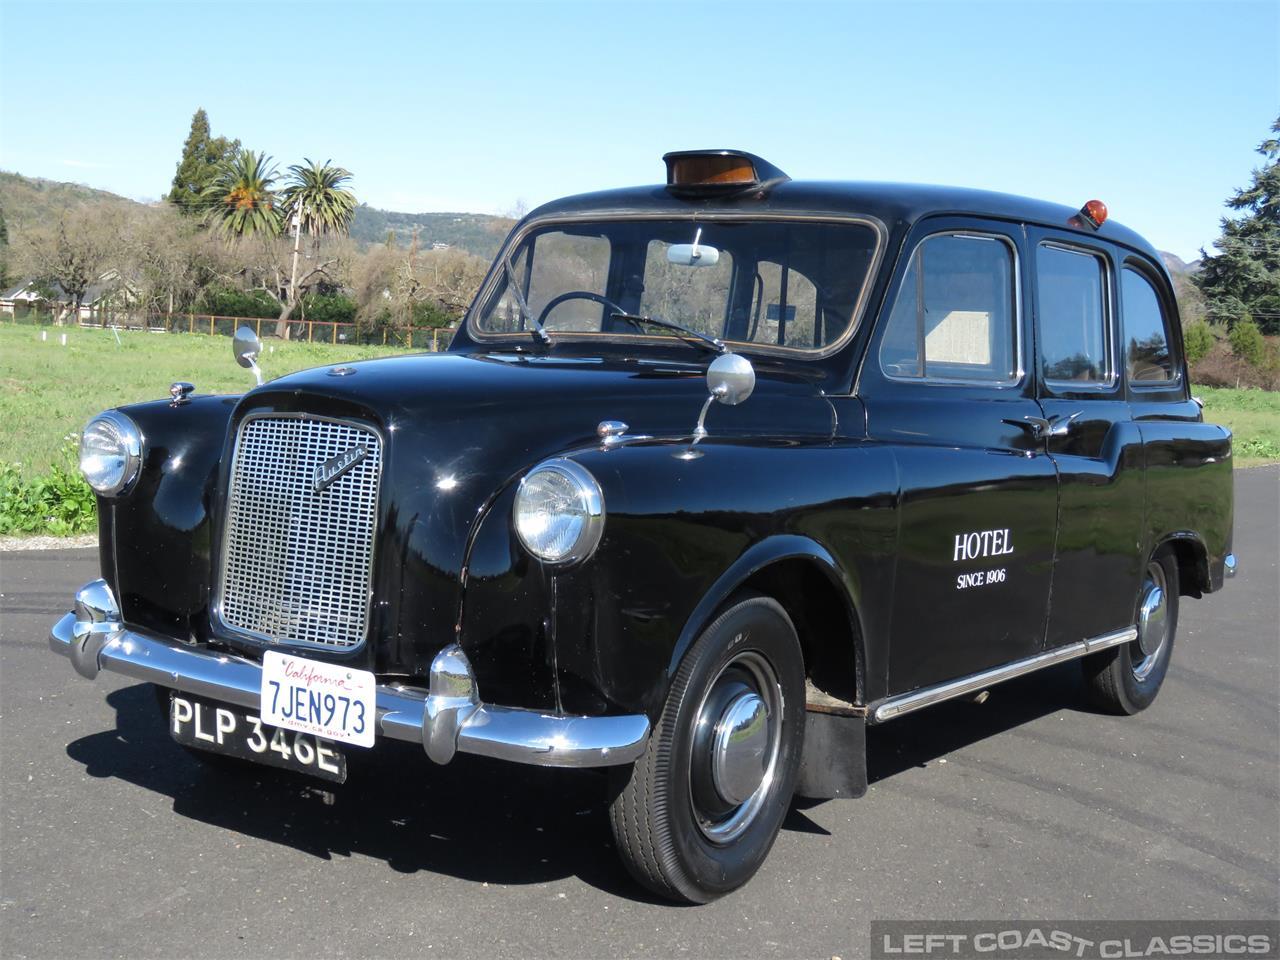 Large Picture of '67 Austin FX4 Taxi Cab located in SONOMA California - PKBX